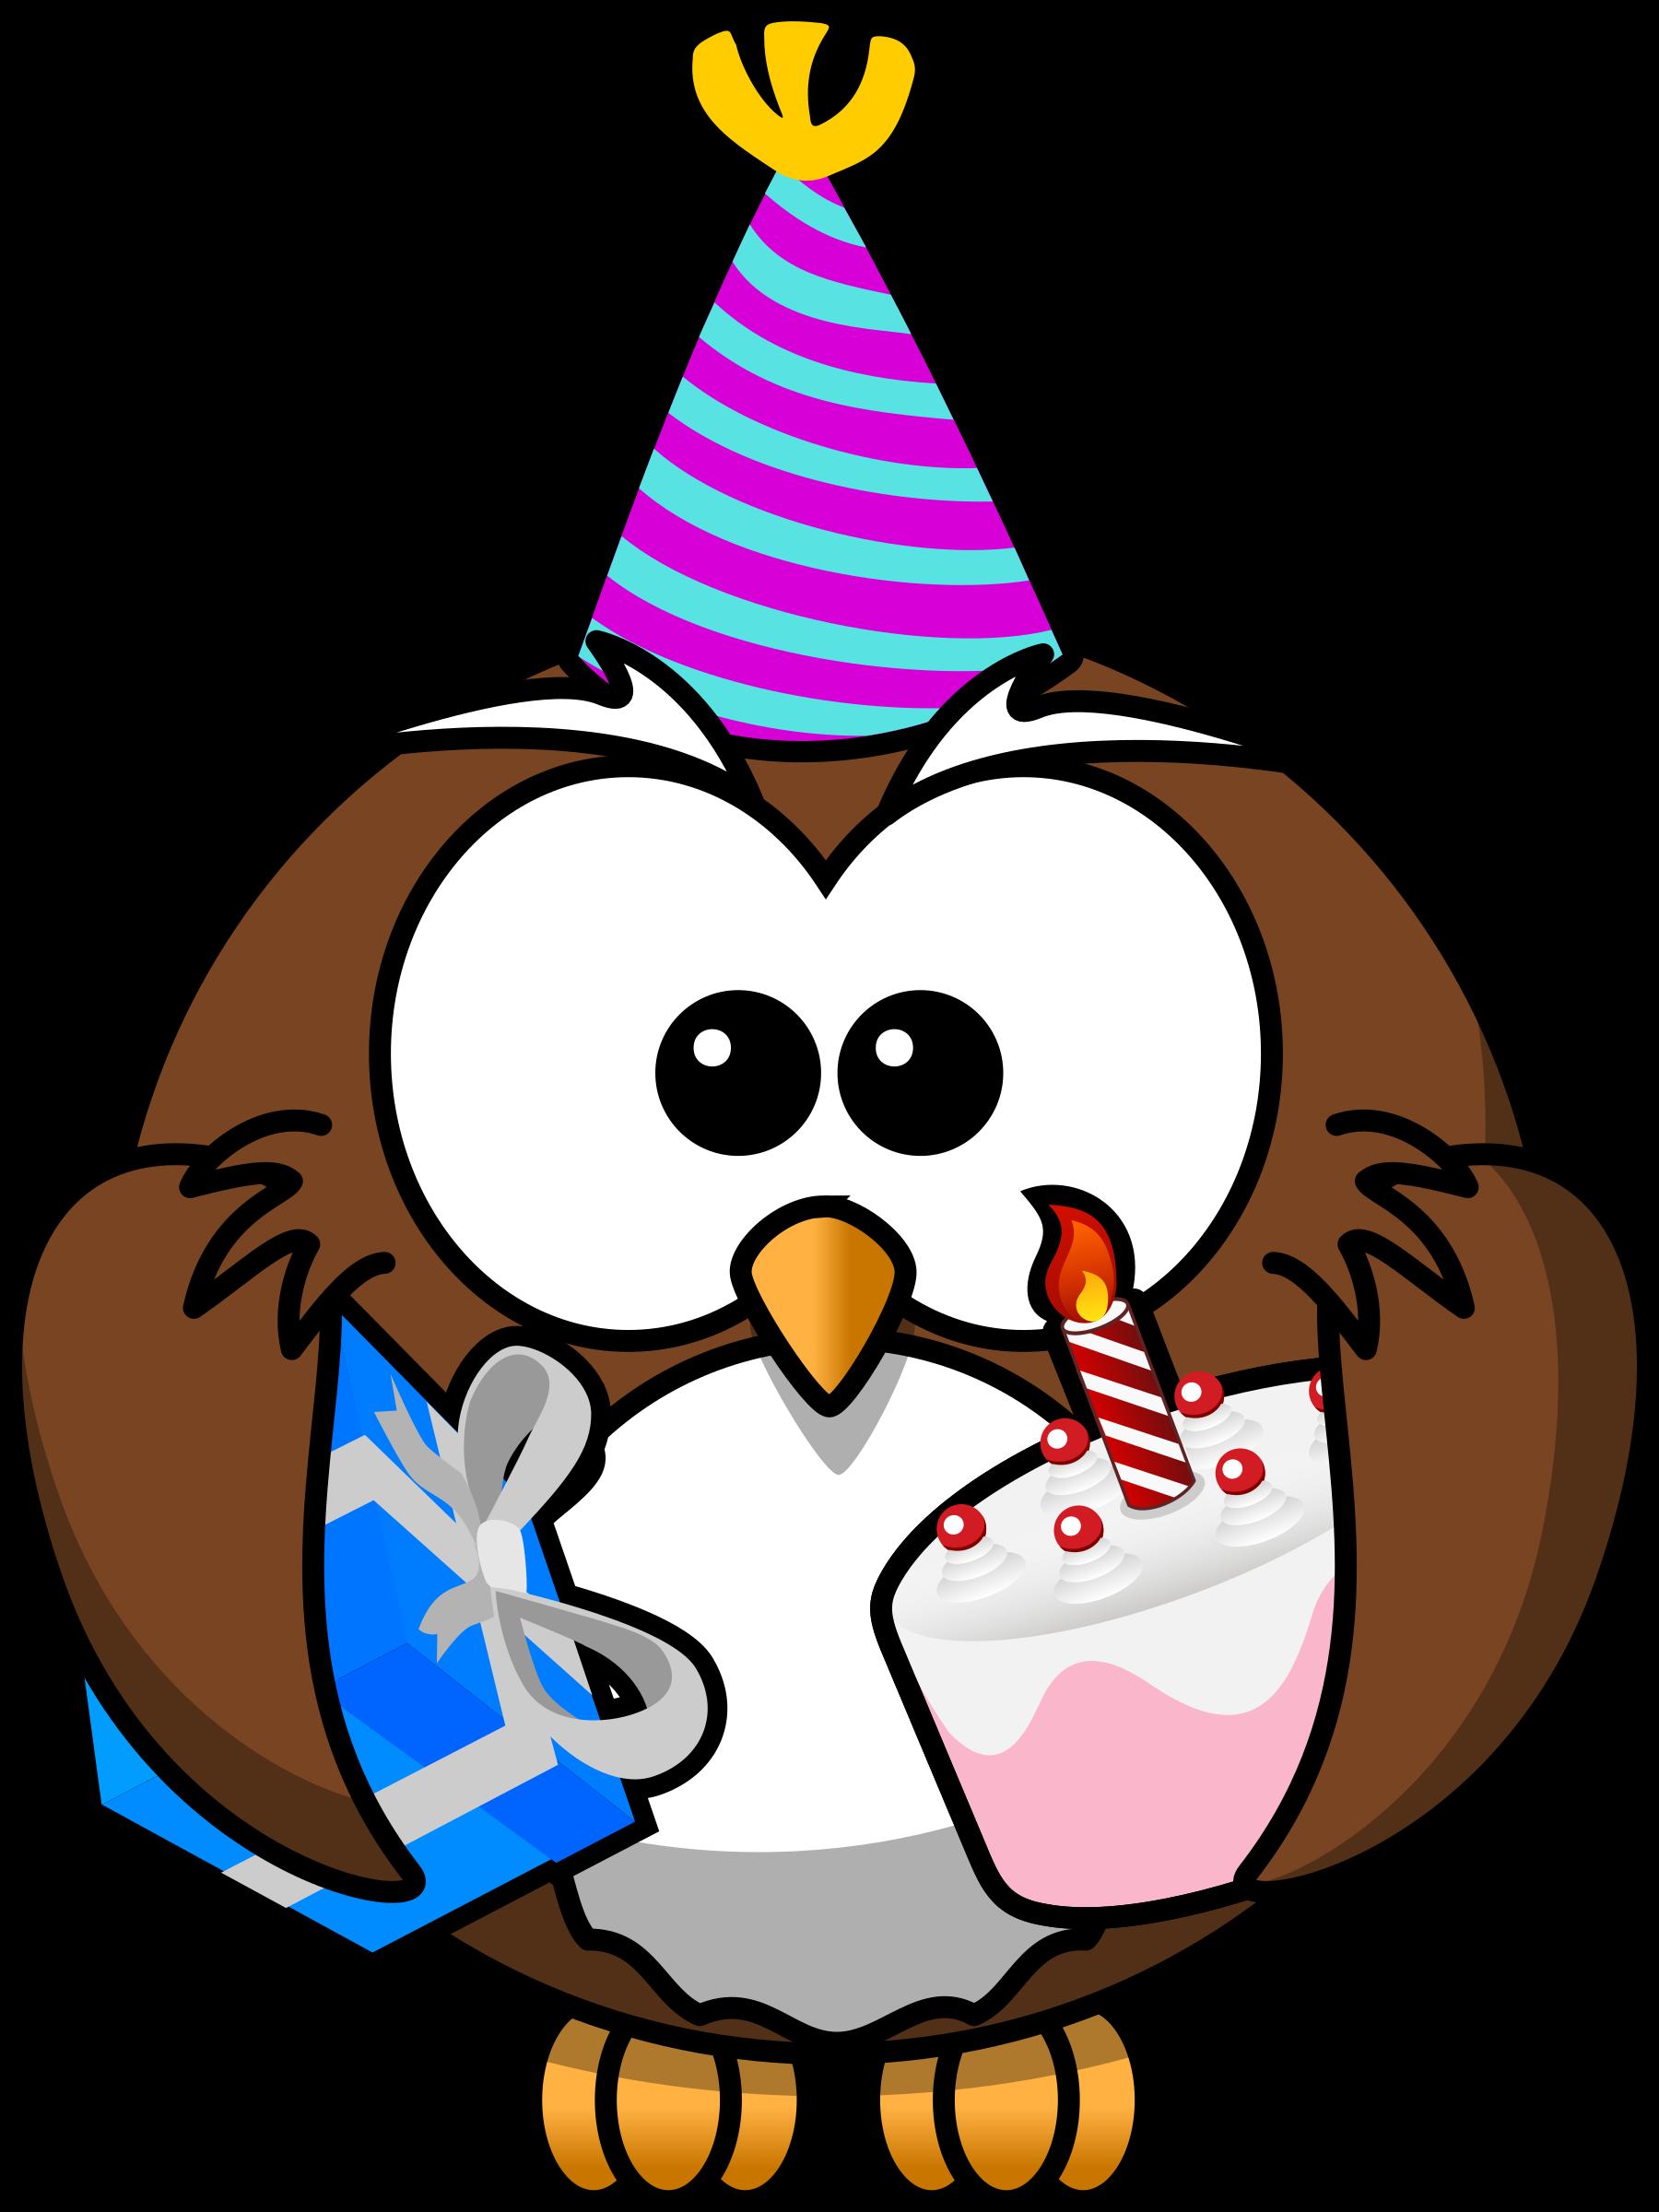 School celebration clipart graphic stock Green Owl Party Clipart graphic stock